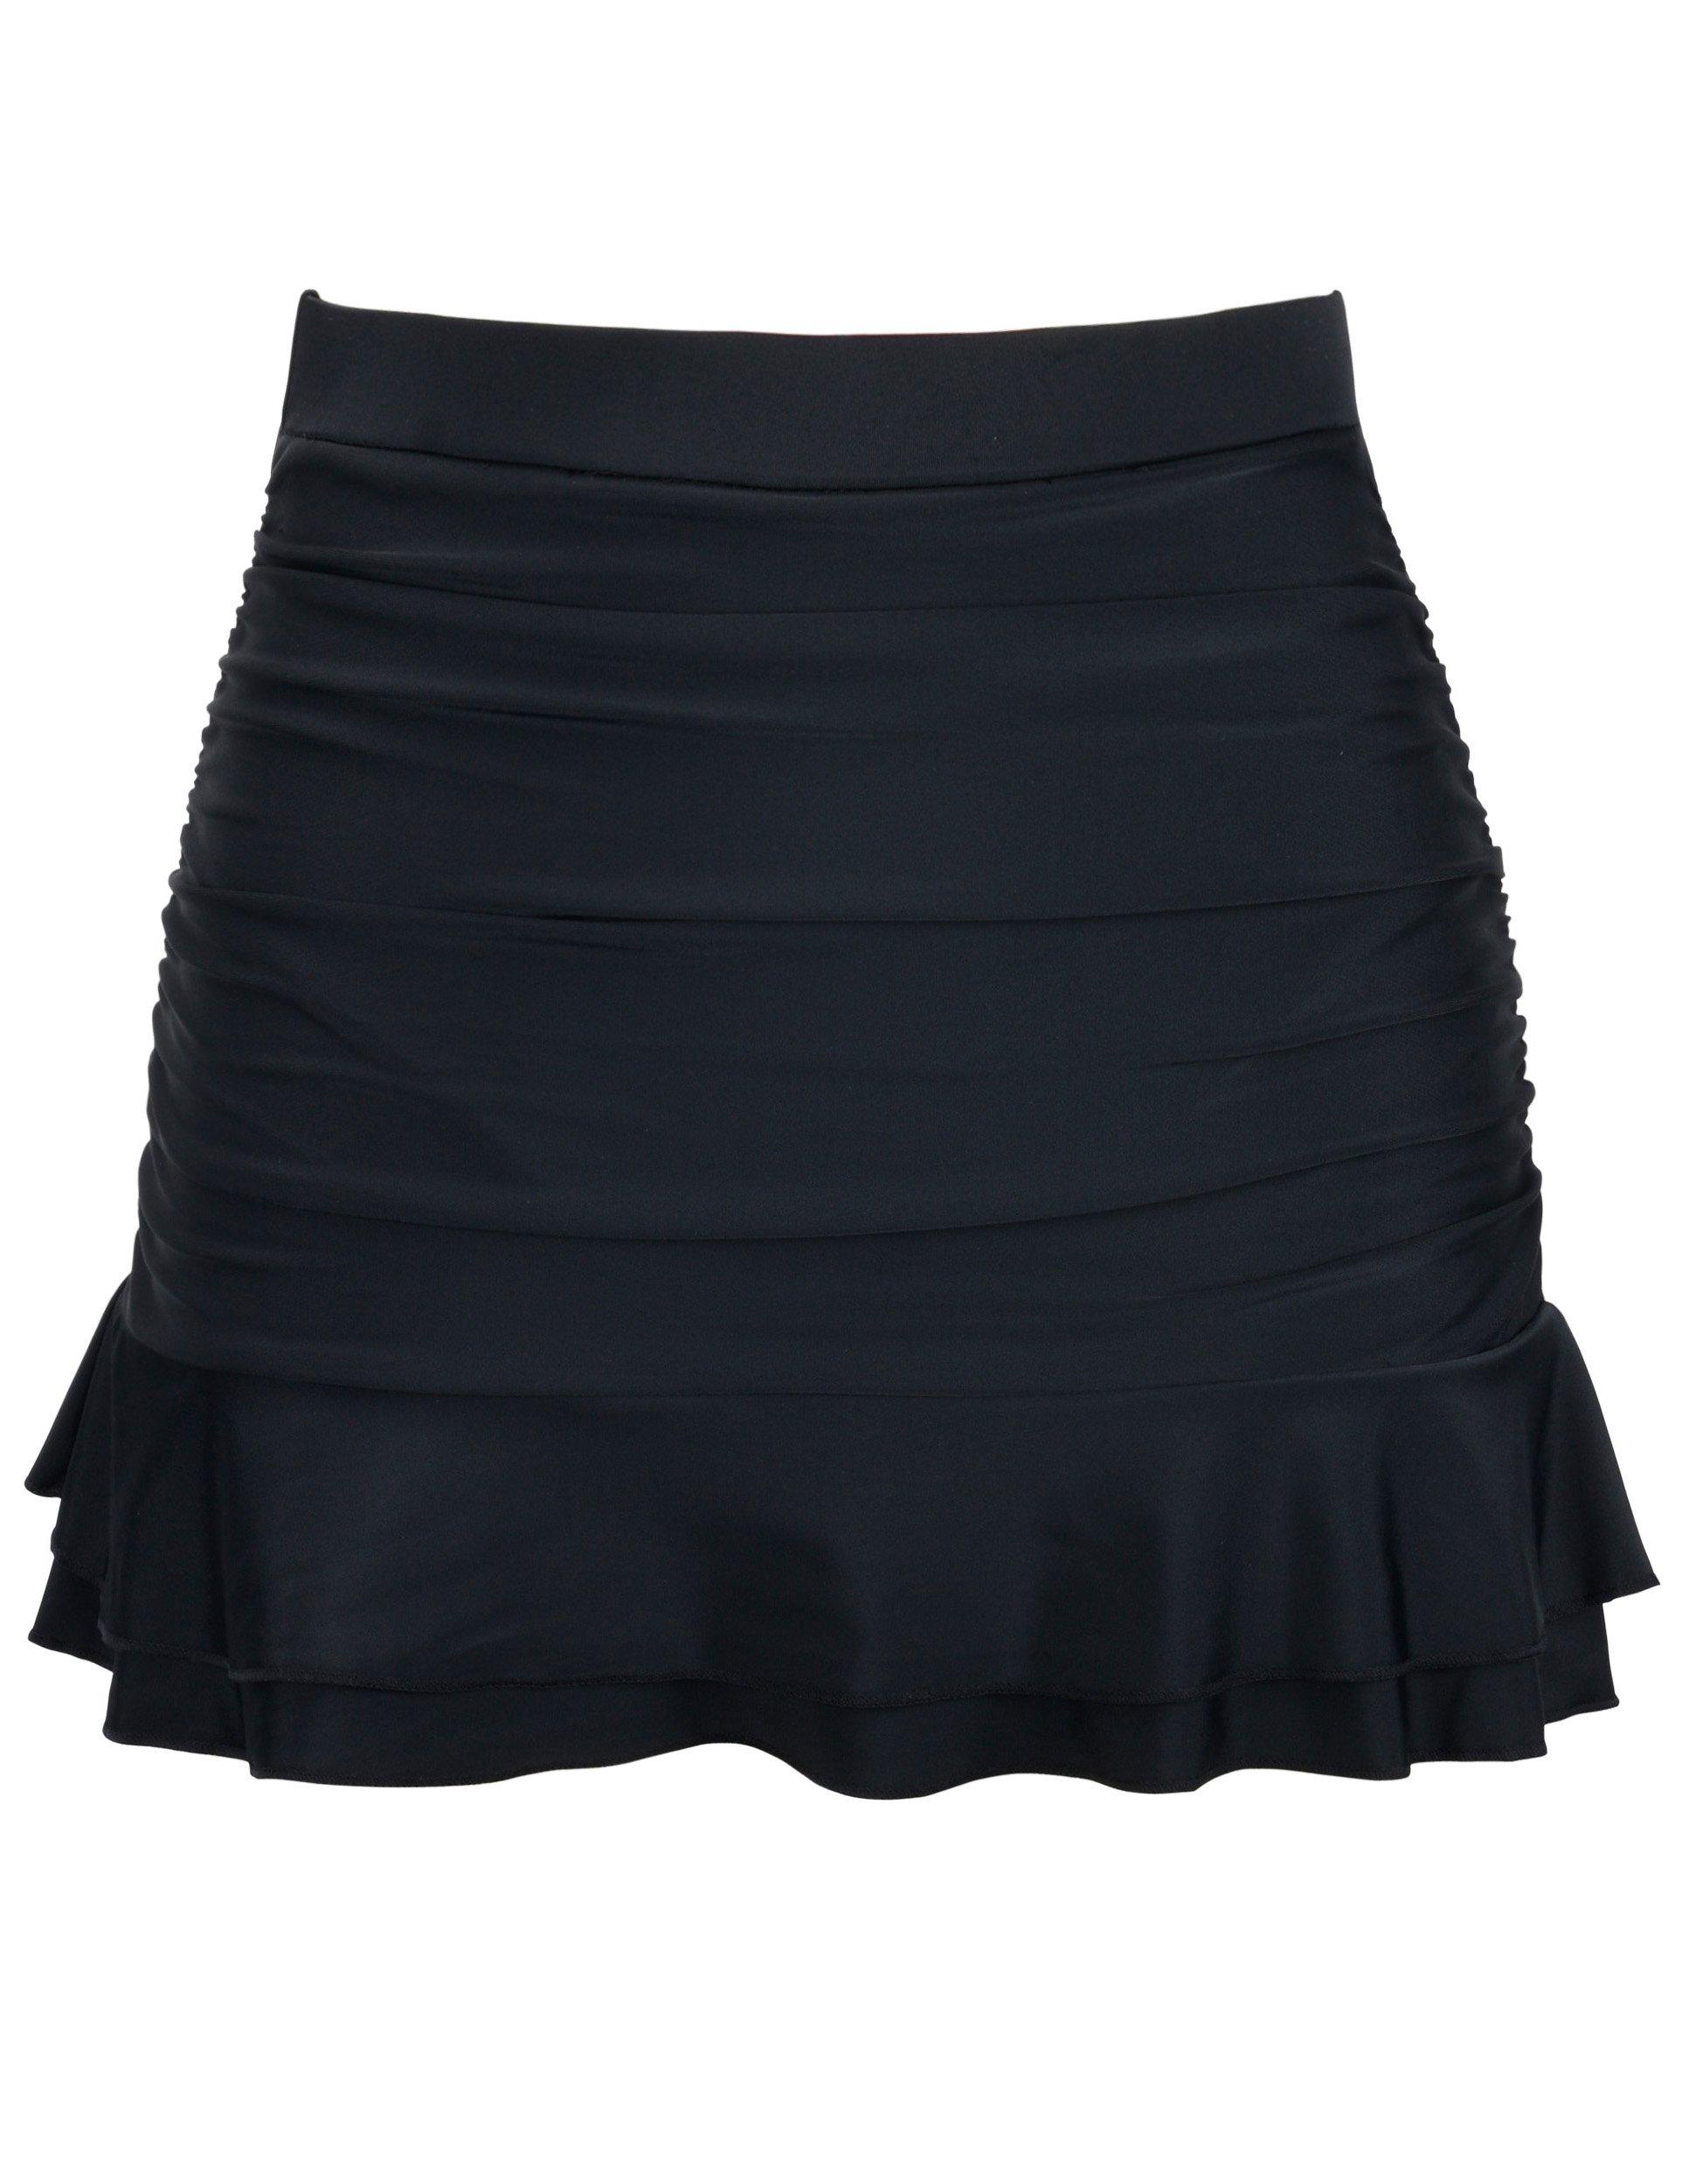 Firpearl Women's Ruched Swimsuit Bikini Tankini Bottom Ruffle Swim Skirt US8 Black